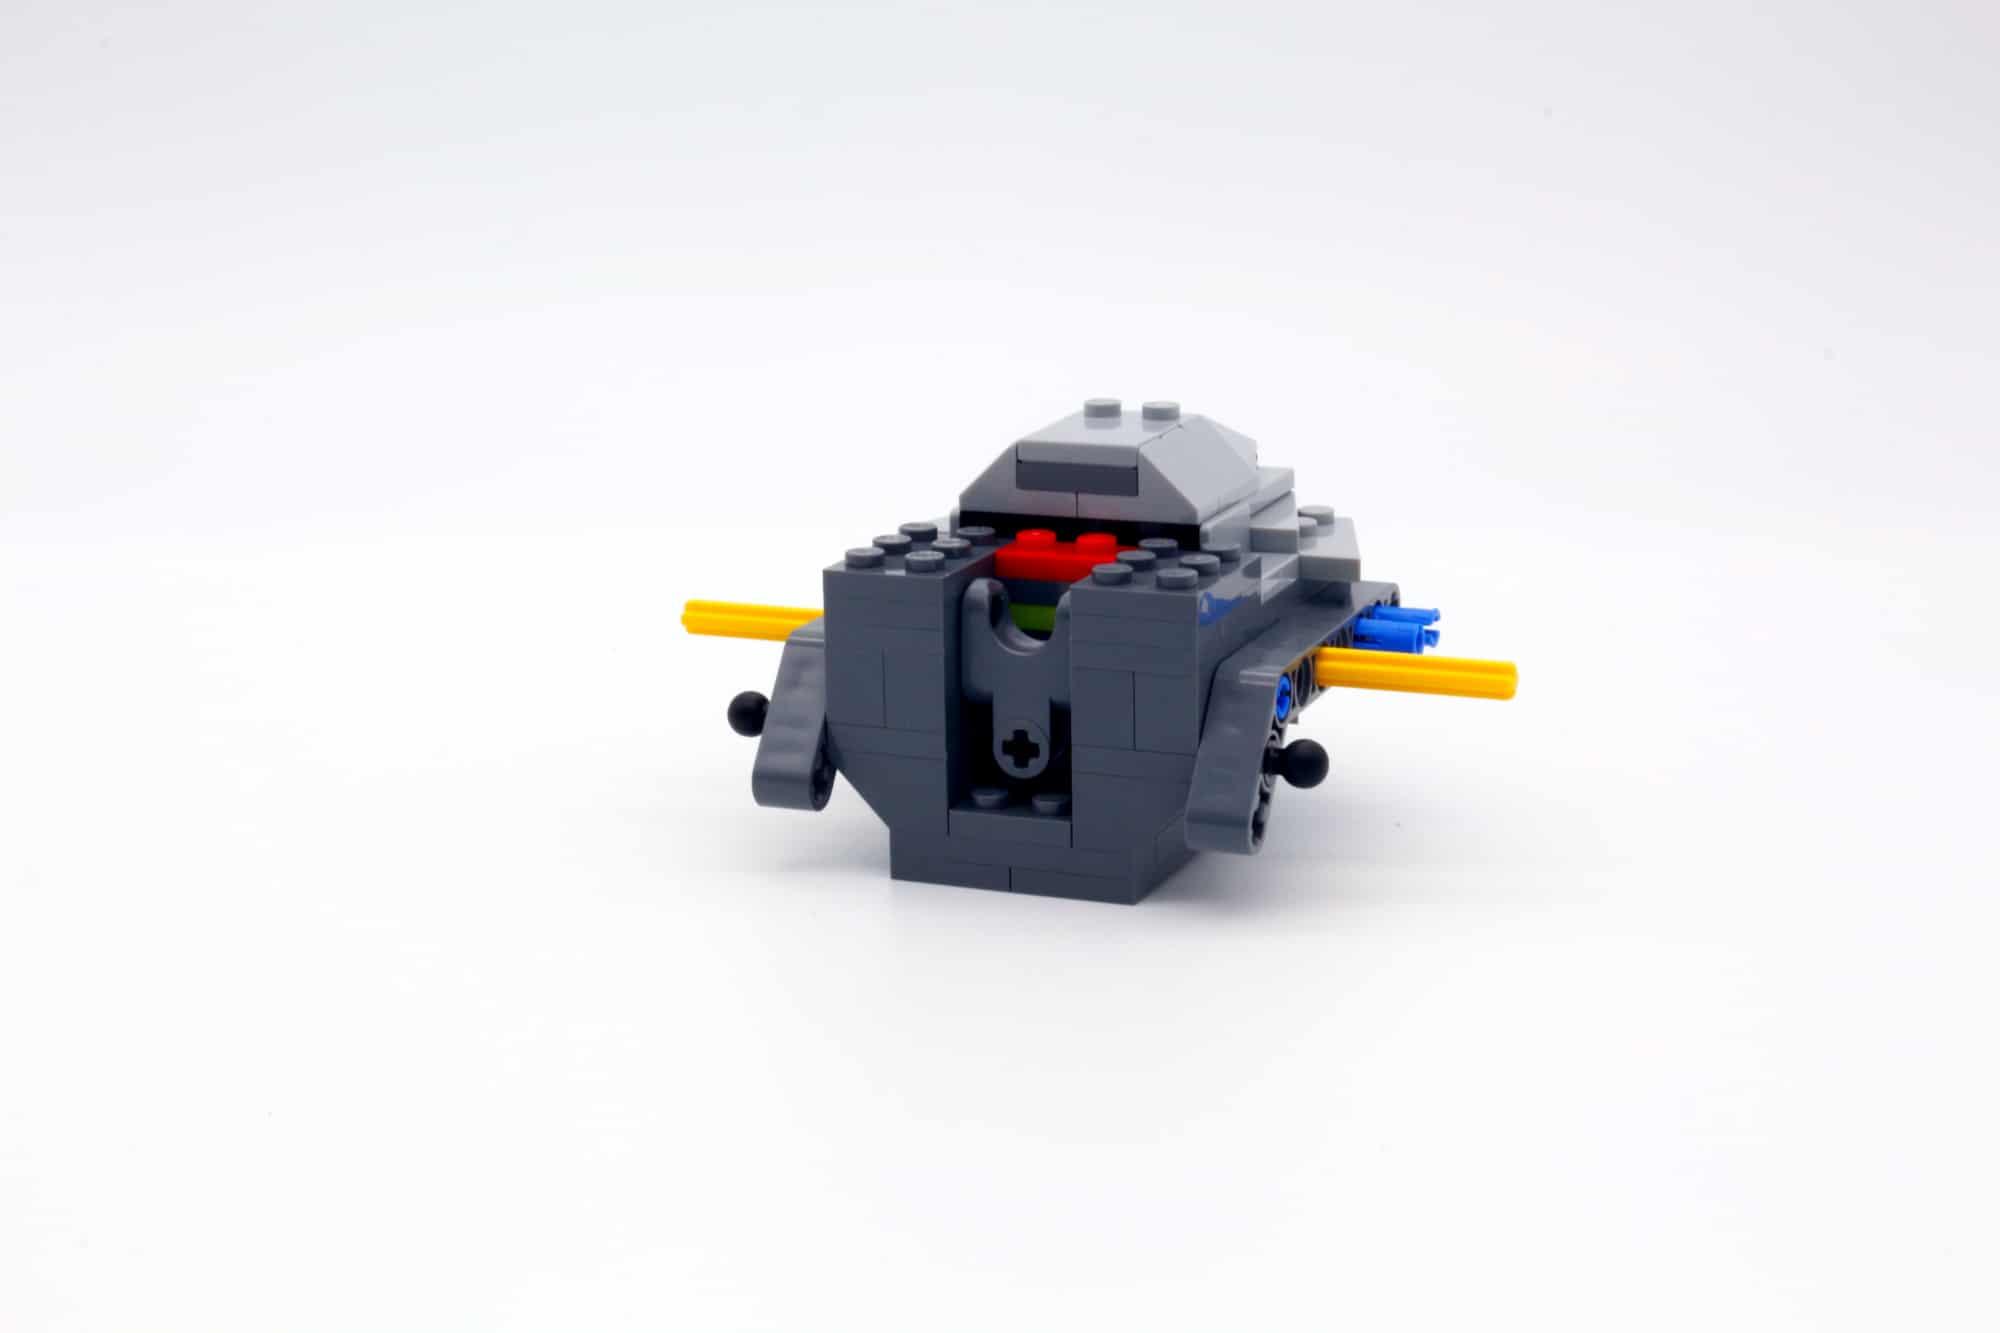 LEGO Star Wars 75316 Mandalorian Starfighter 20